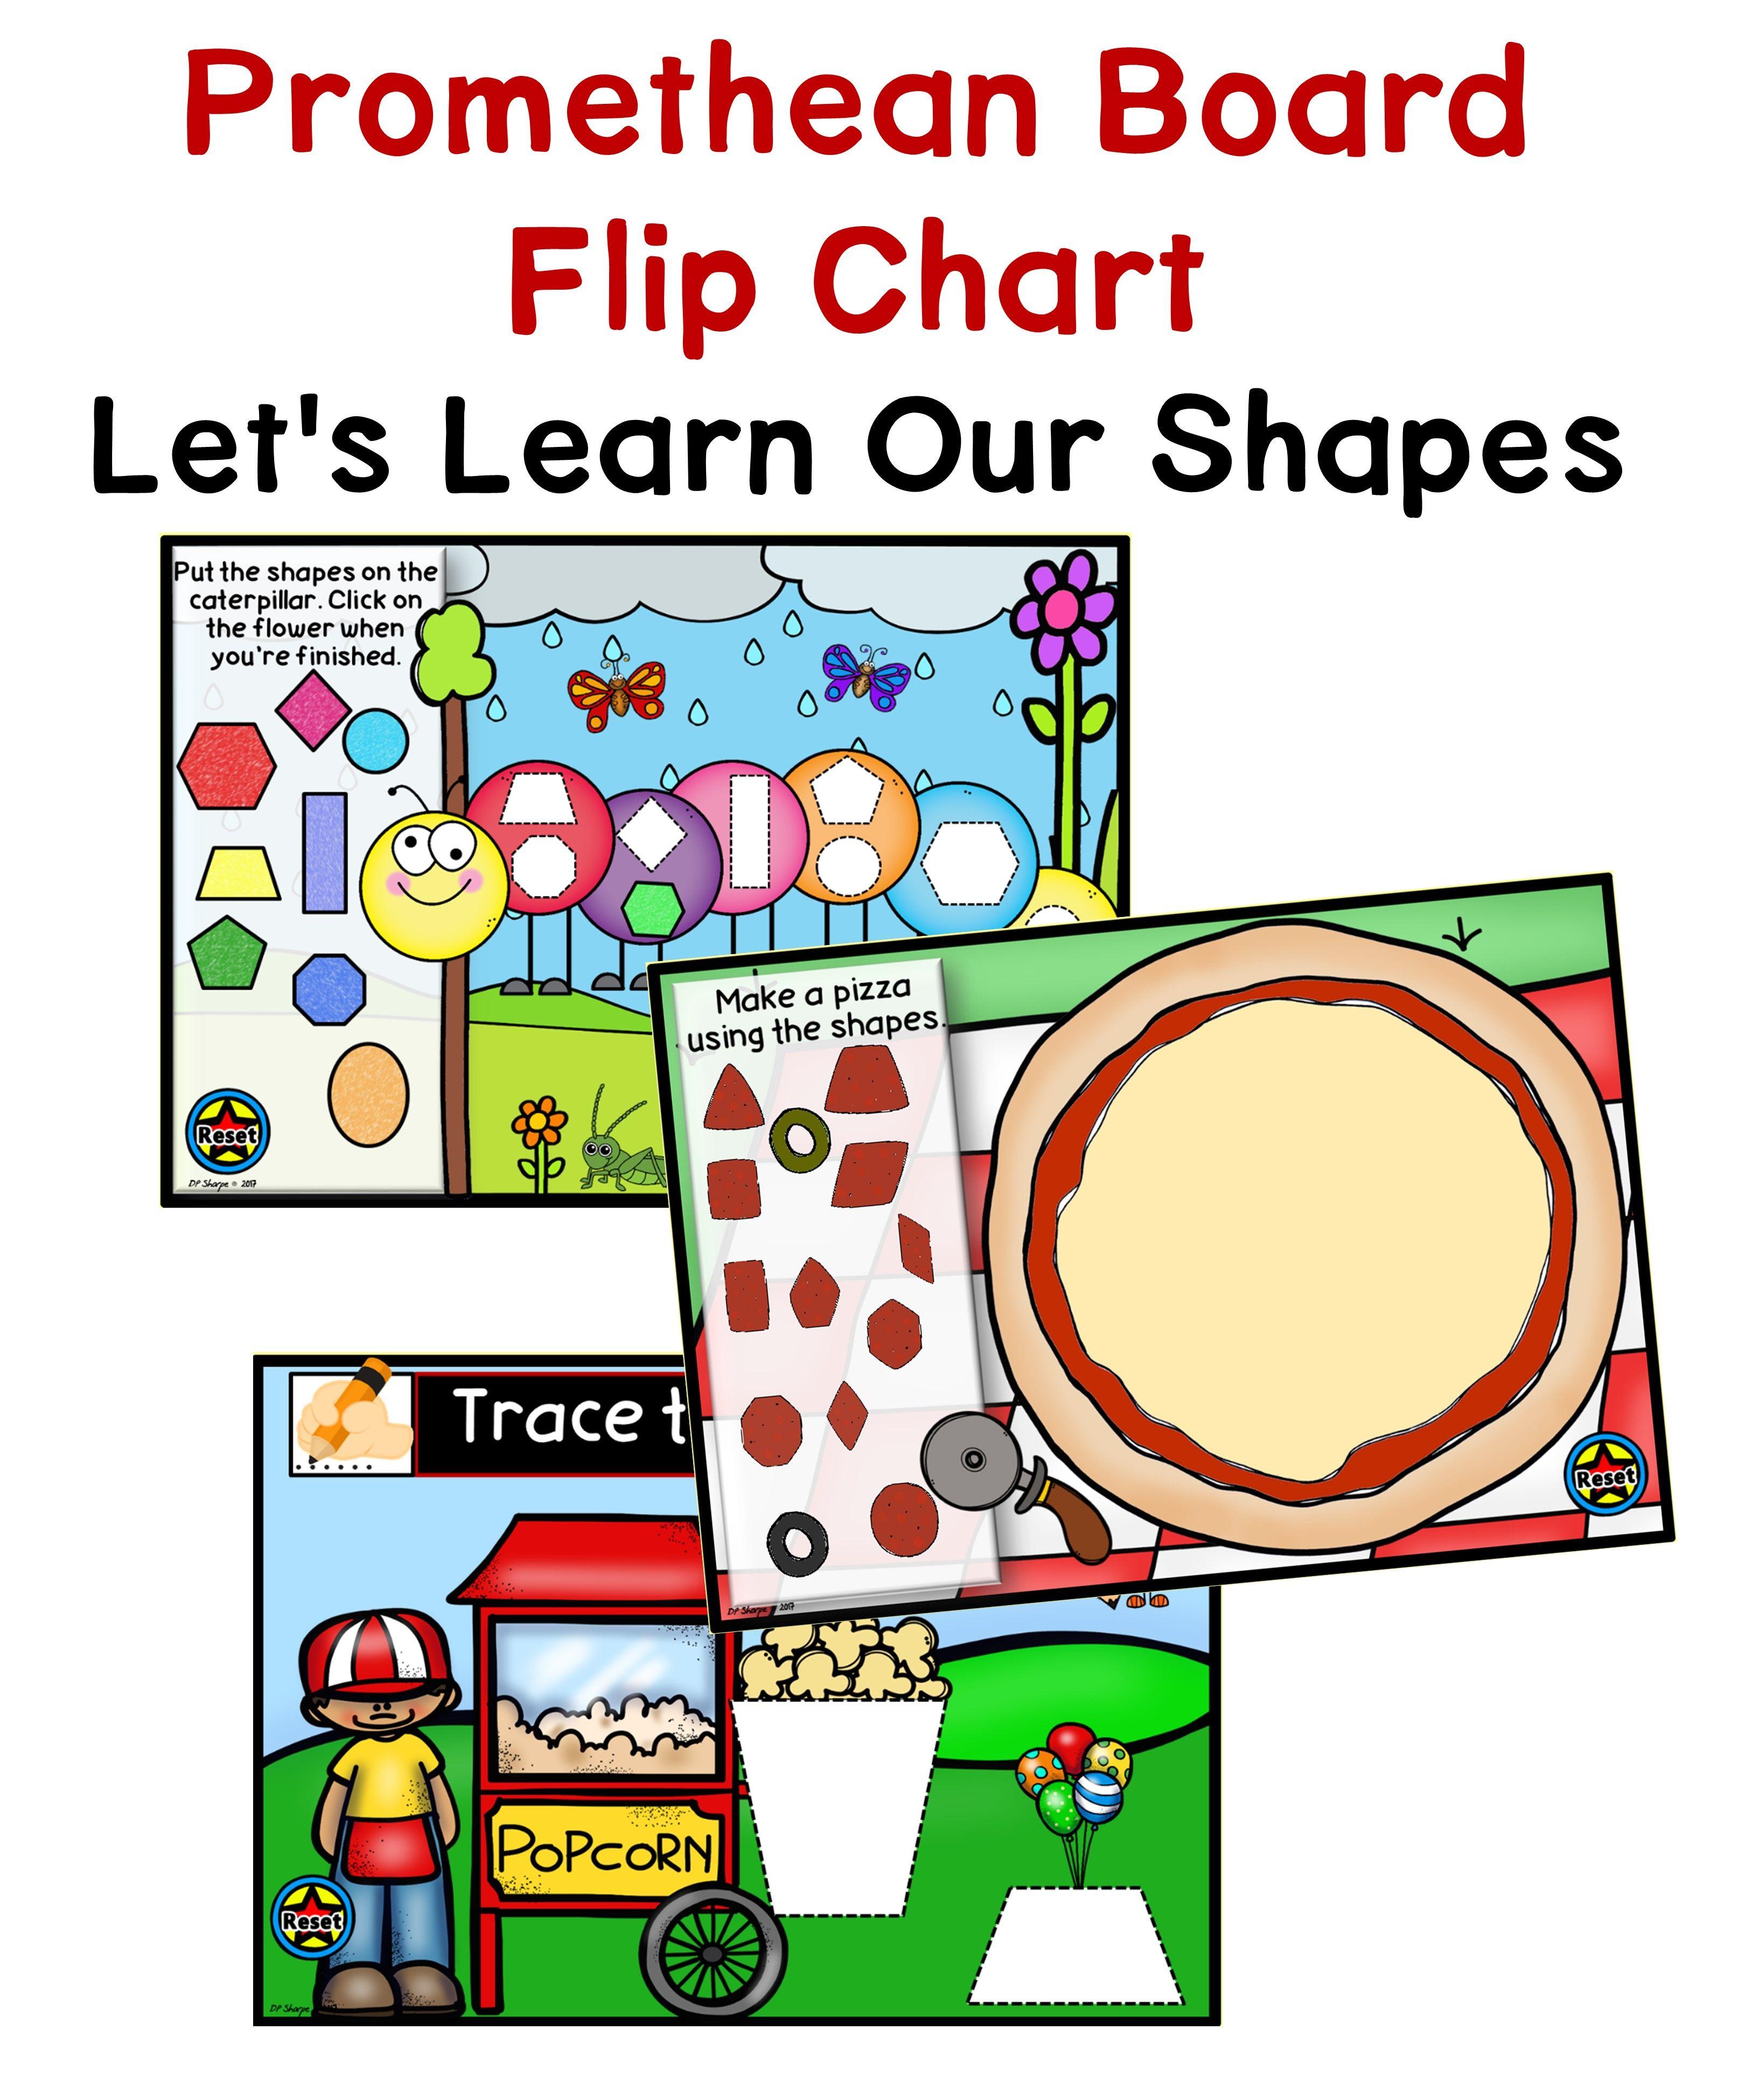 Shapes Promethean Board Flip Chart